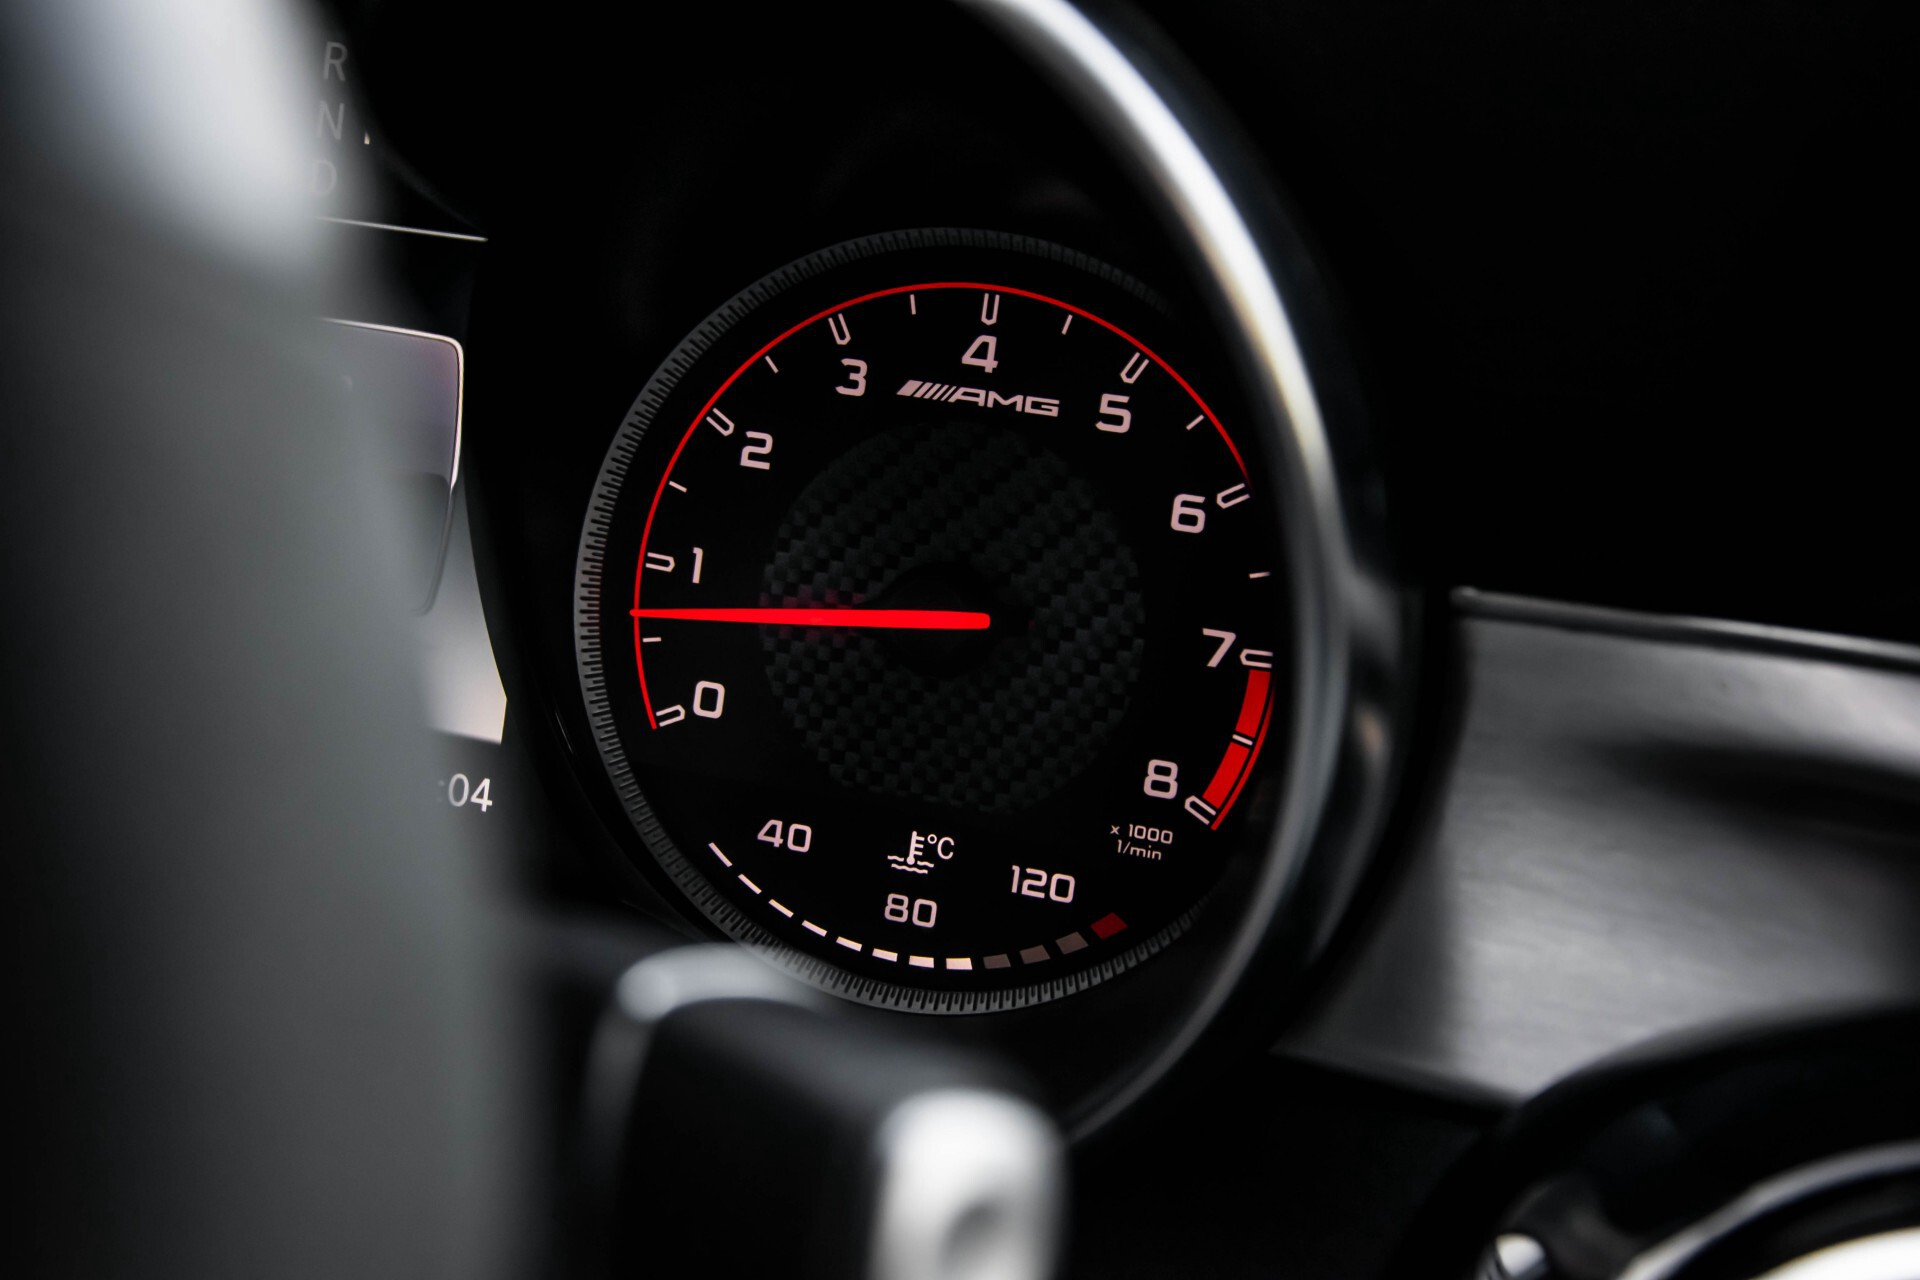 Mercedes-Benz C-Klasse 63 AMG S Panorama/Distronic/Keyless/Comand/Camera/ILS Aut7 Foto 33